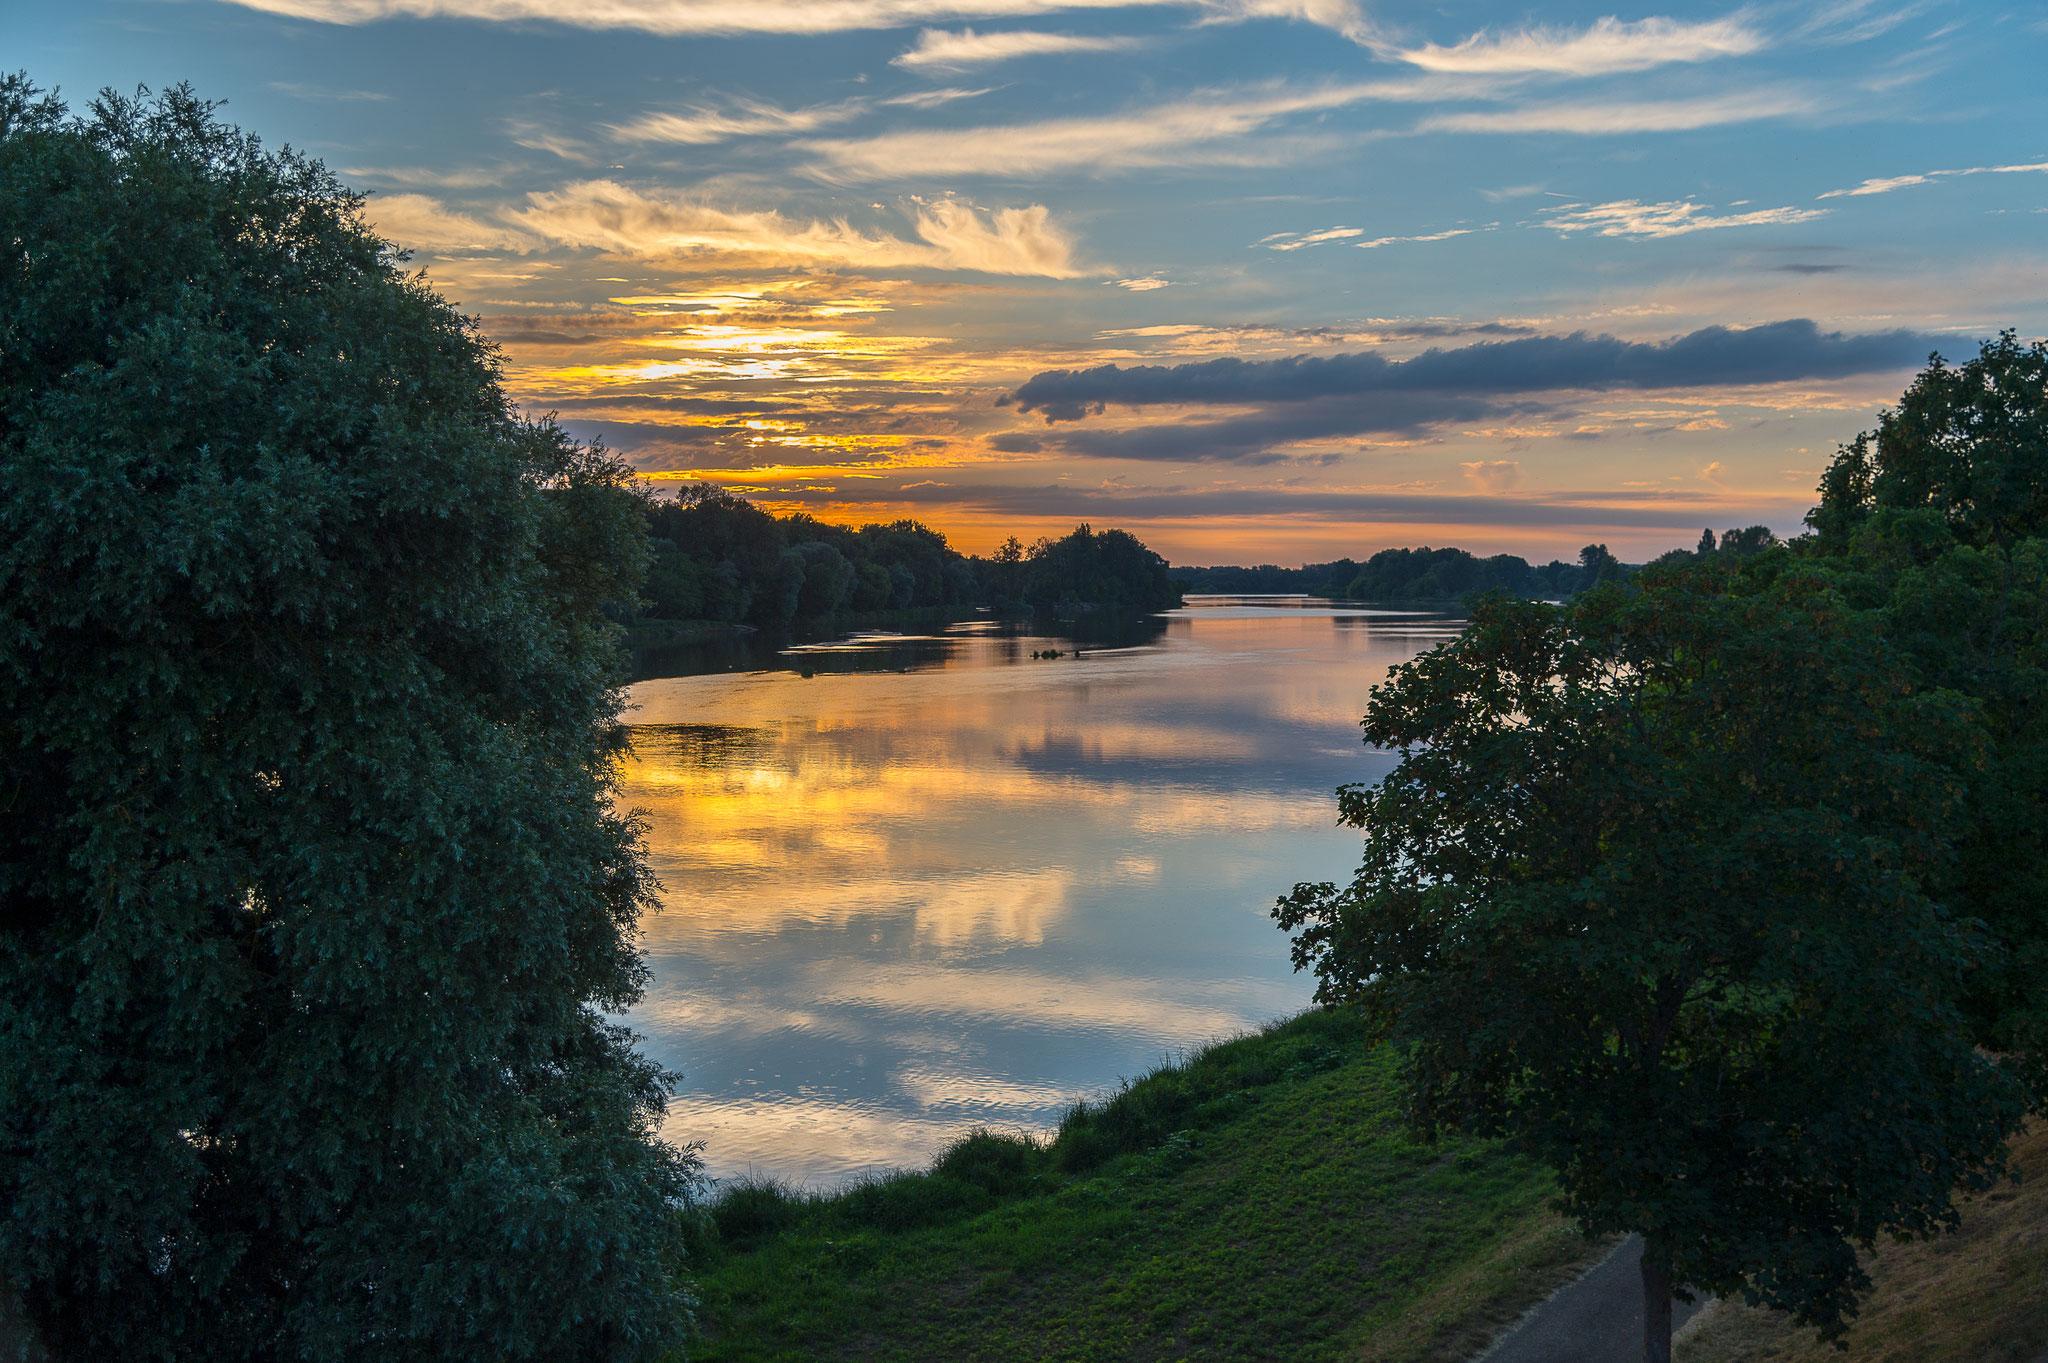 Canal de Briare-Loiret